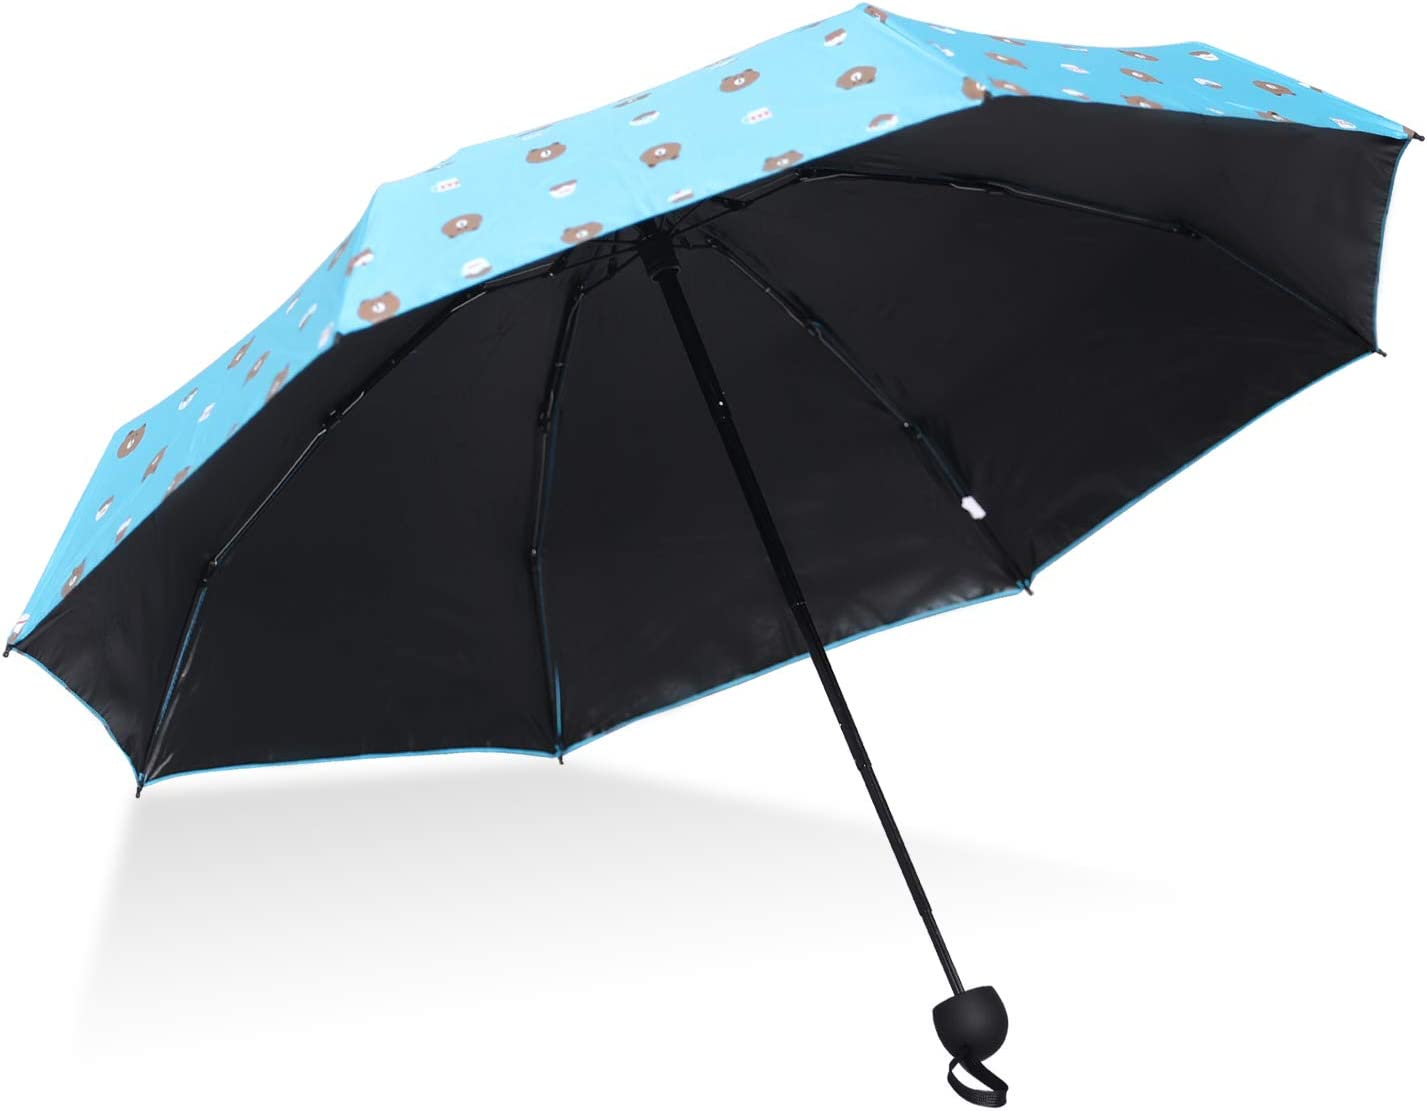 ABCCANOPY Umbrella Windproof Sun & Rain Umbrellas Folding Compact Umbrella Portable Lightweight UV resistant